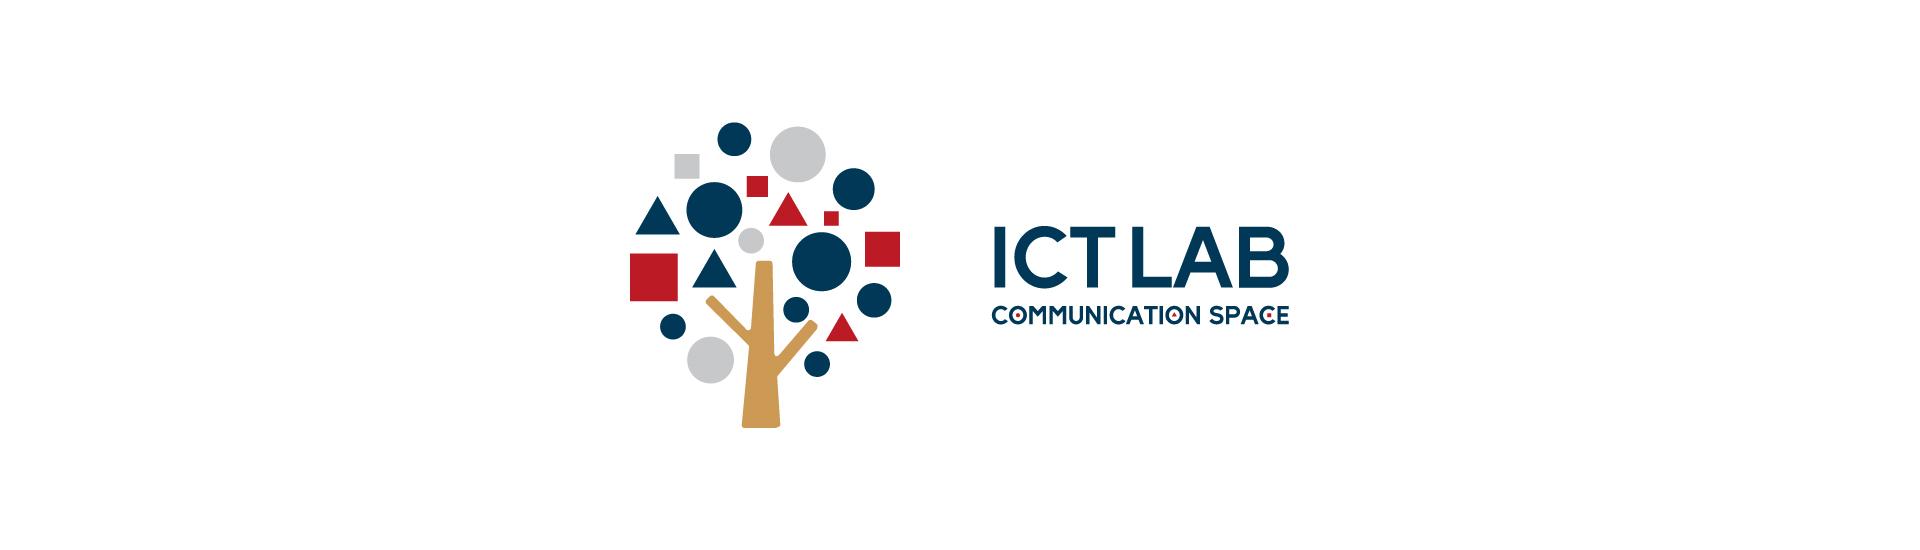 ICT LAB.jpg